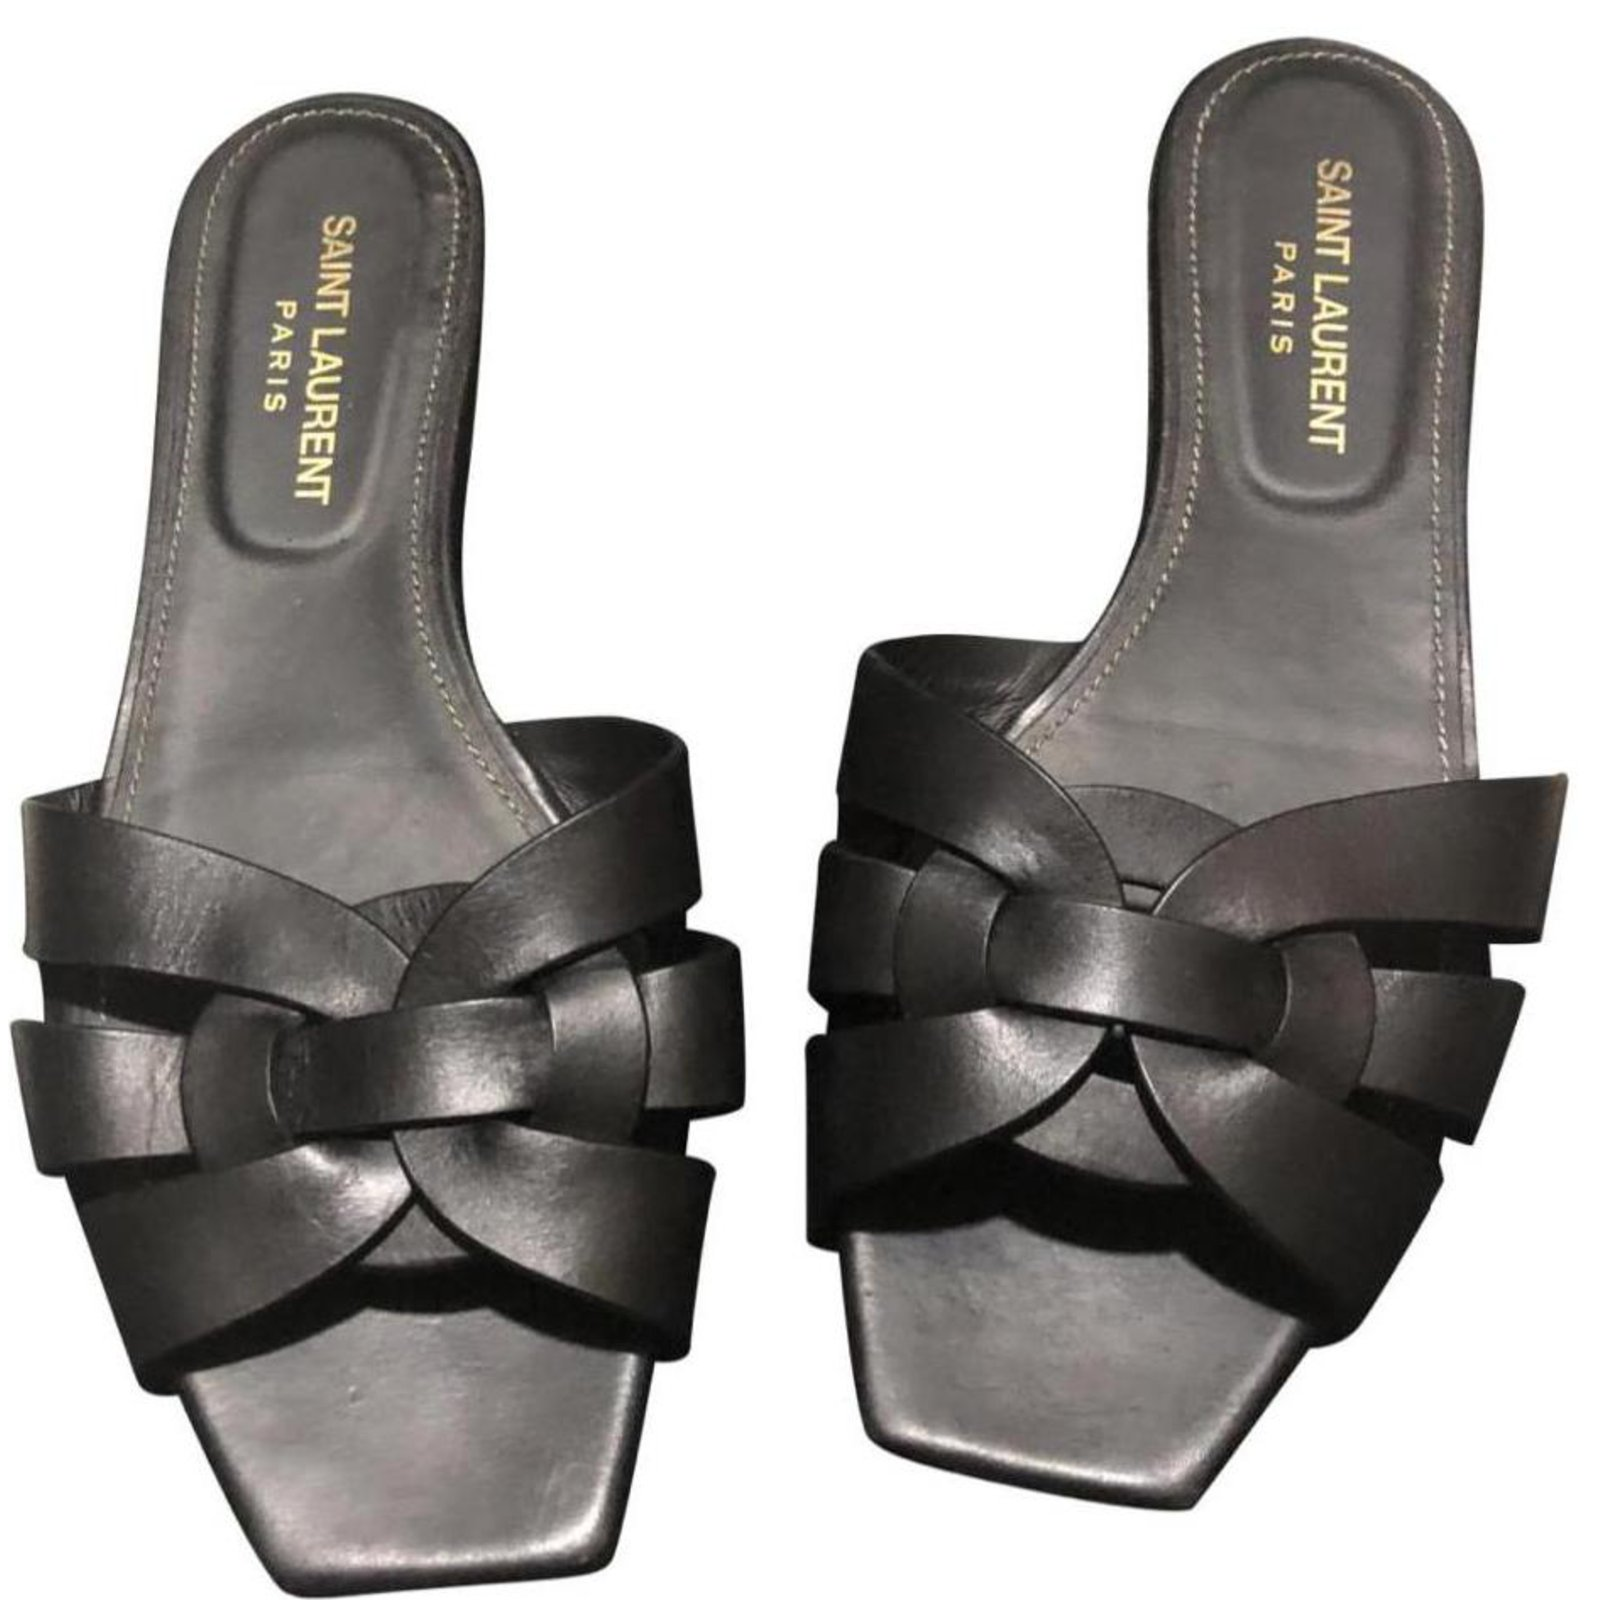 60854f429f9 Yves Saint Laurent TRIBUTE Sandals Leather Black ref.111950 - Joli ...